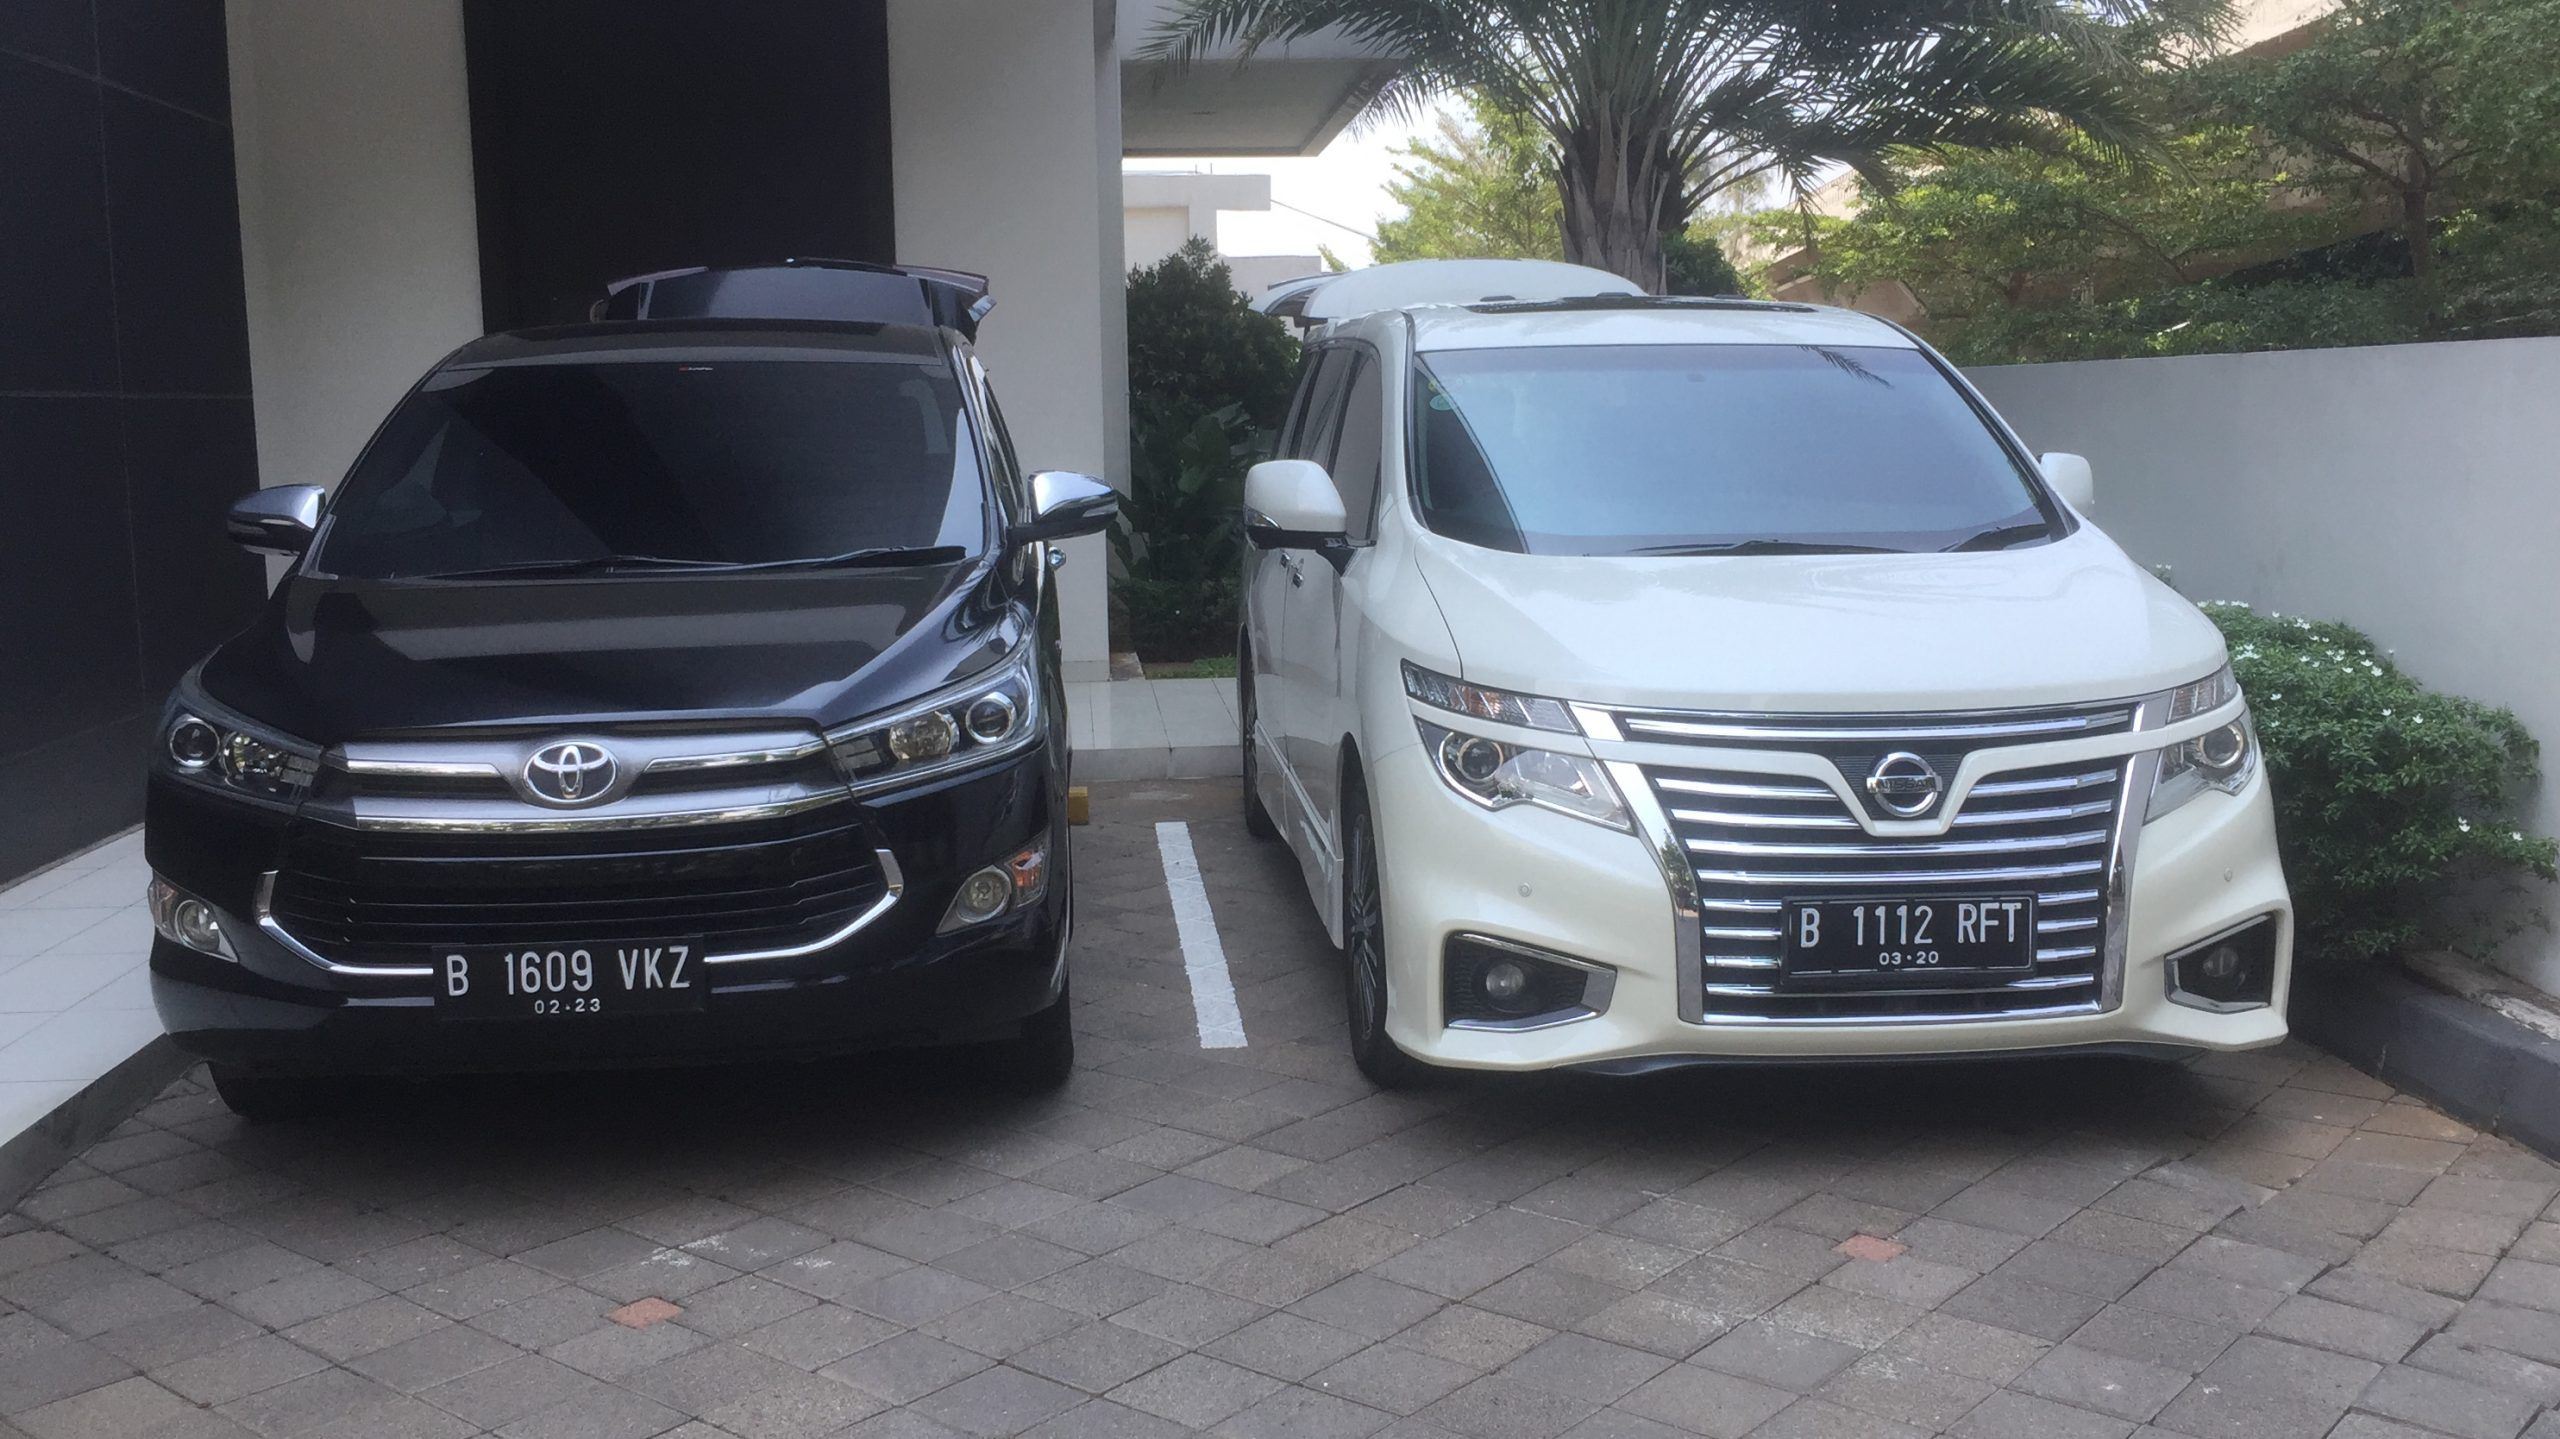 Rental Mobil Hotel Indonesia Kempinski Toyota Camry Kendaraan Mobil